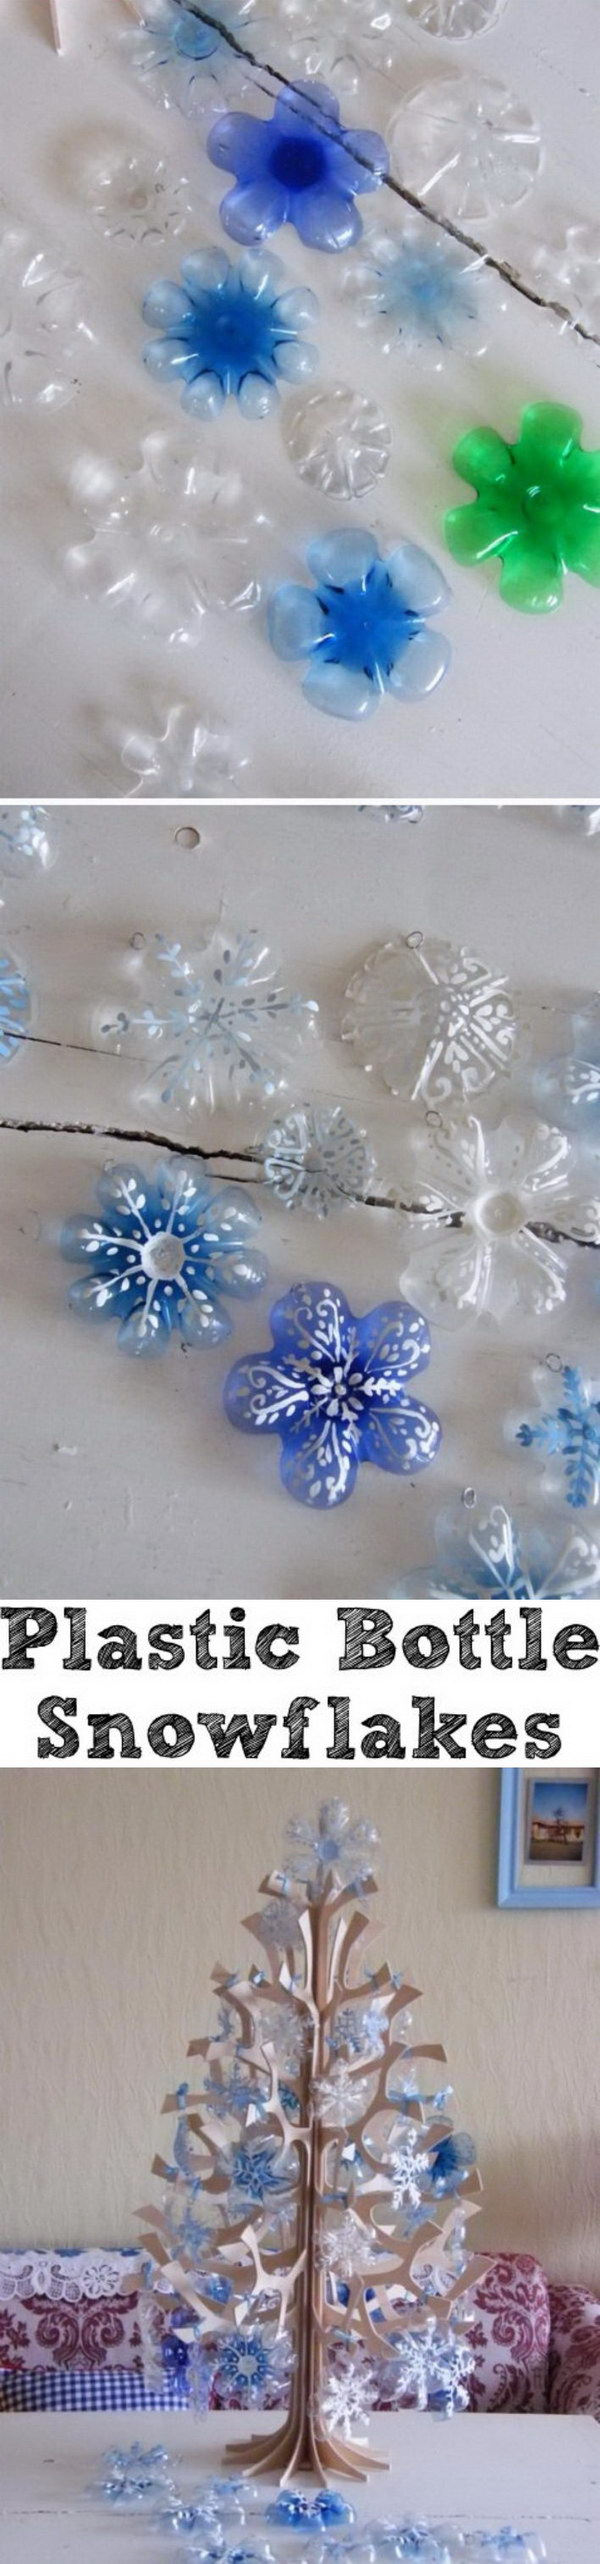 Plastic Bottle Snowflakes.